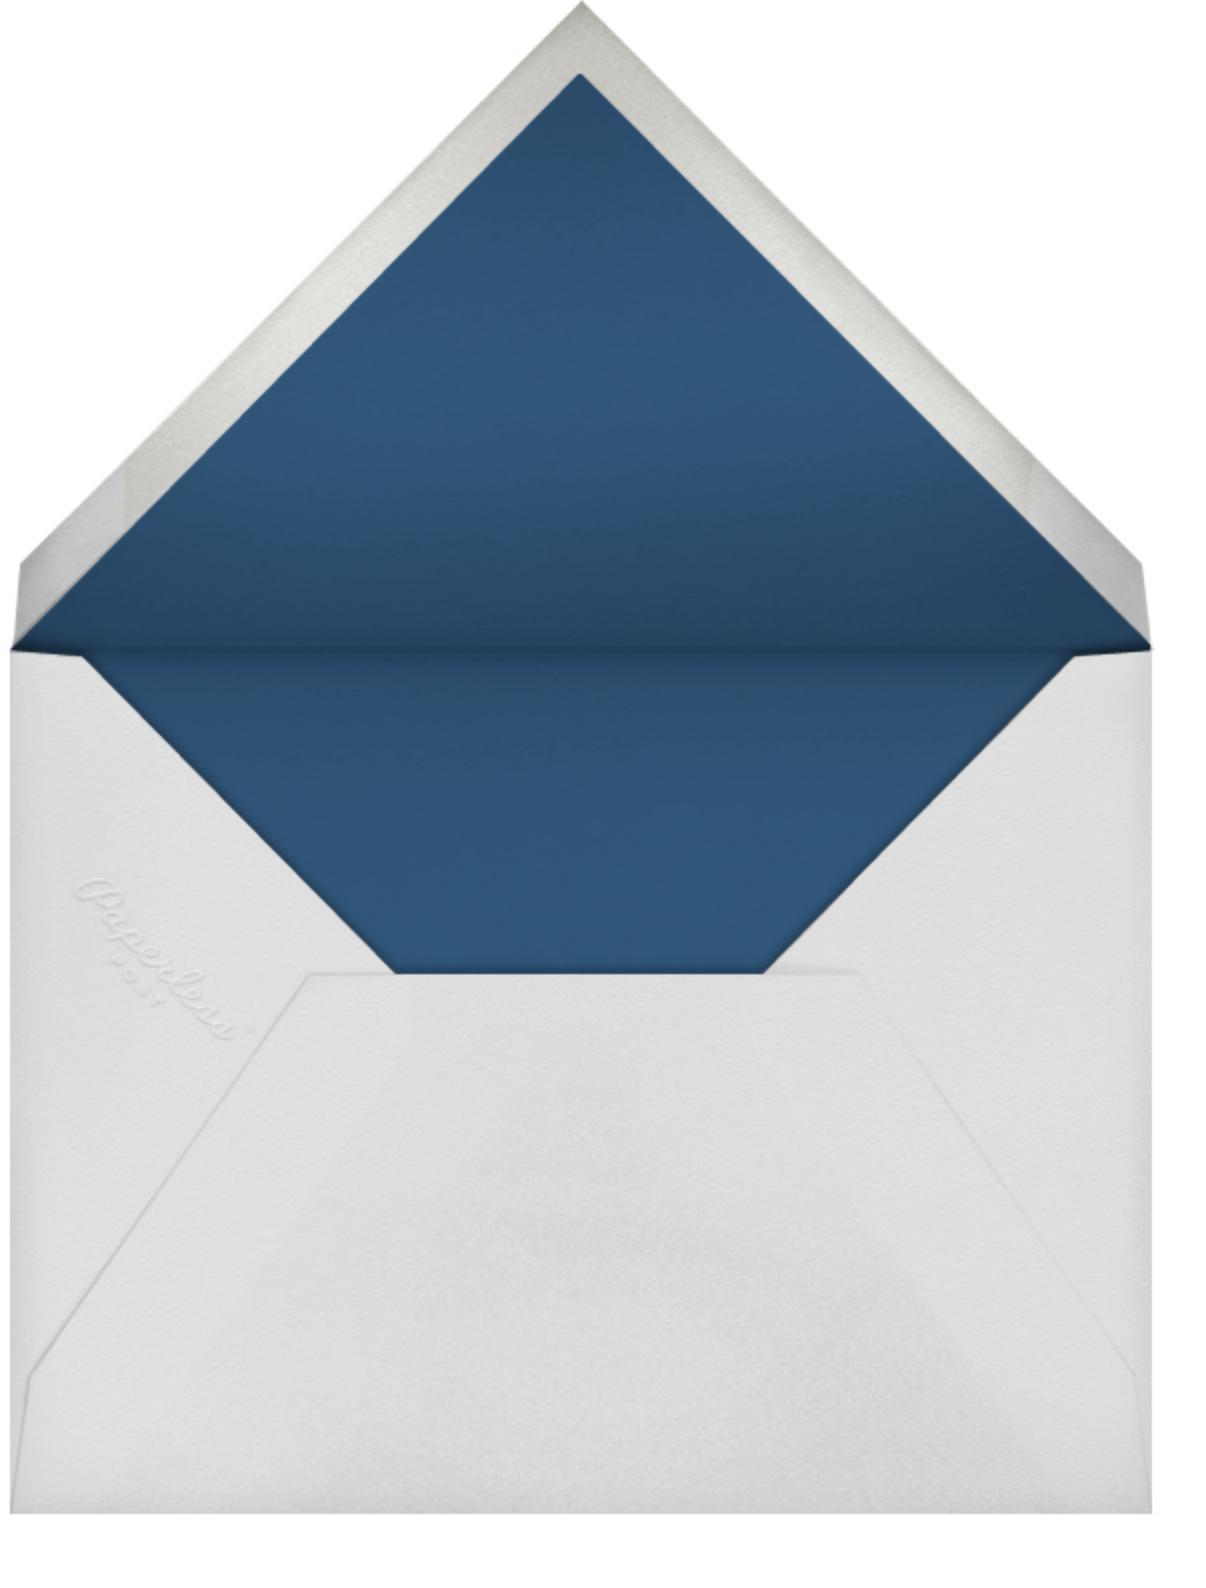 Jemma Street (Stationery) - Gray - kate spade new york - Envelope